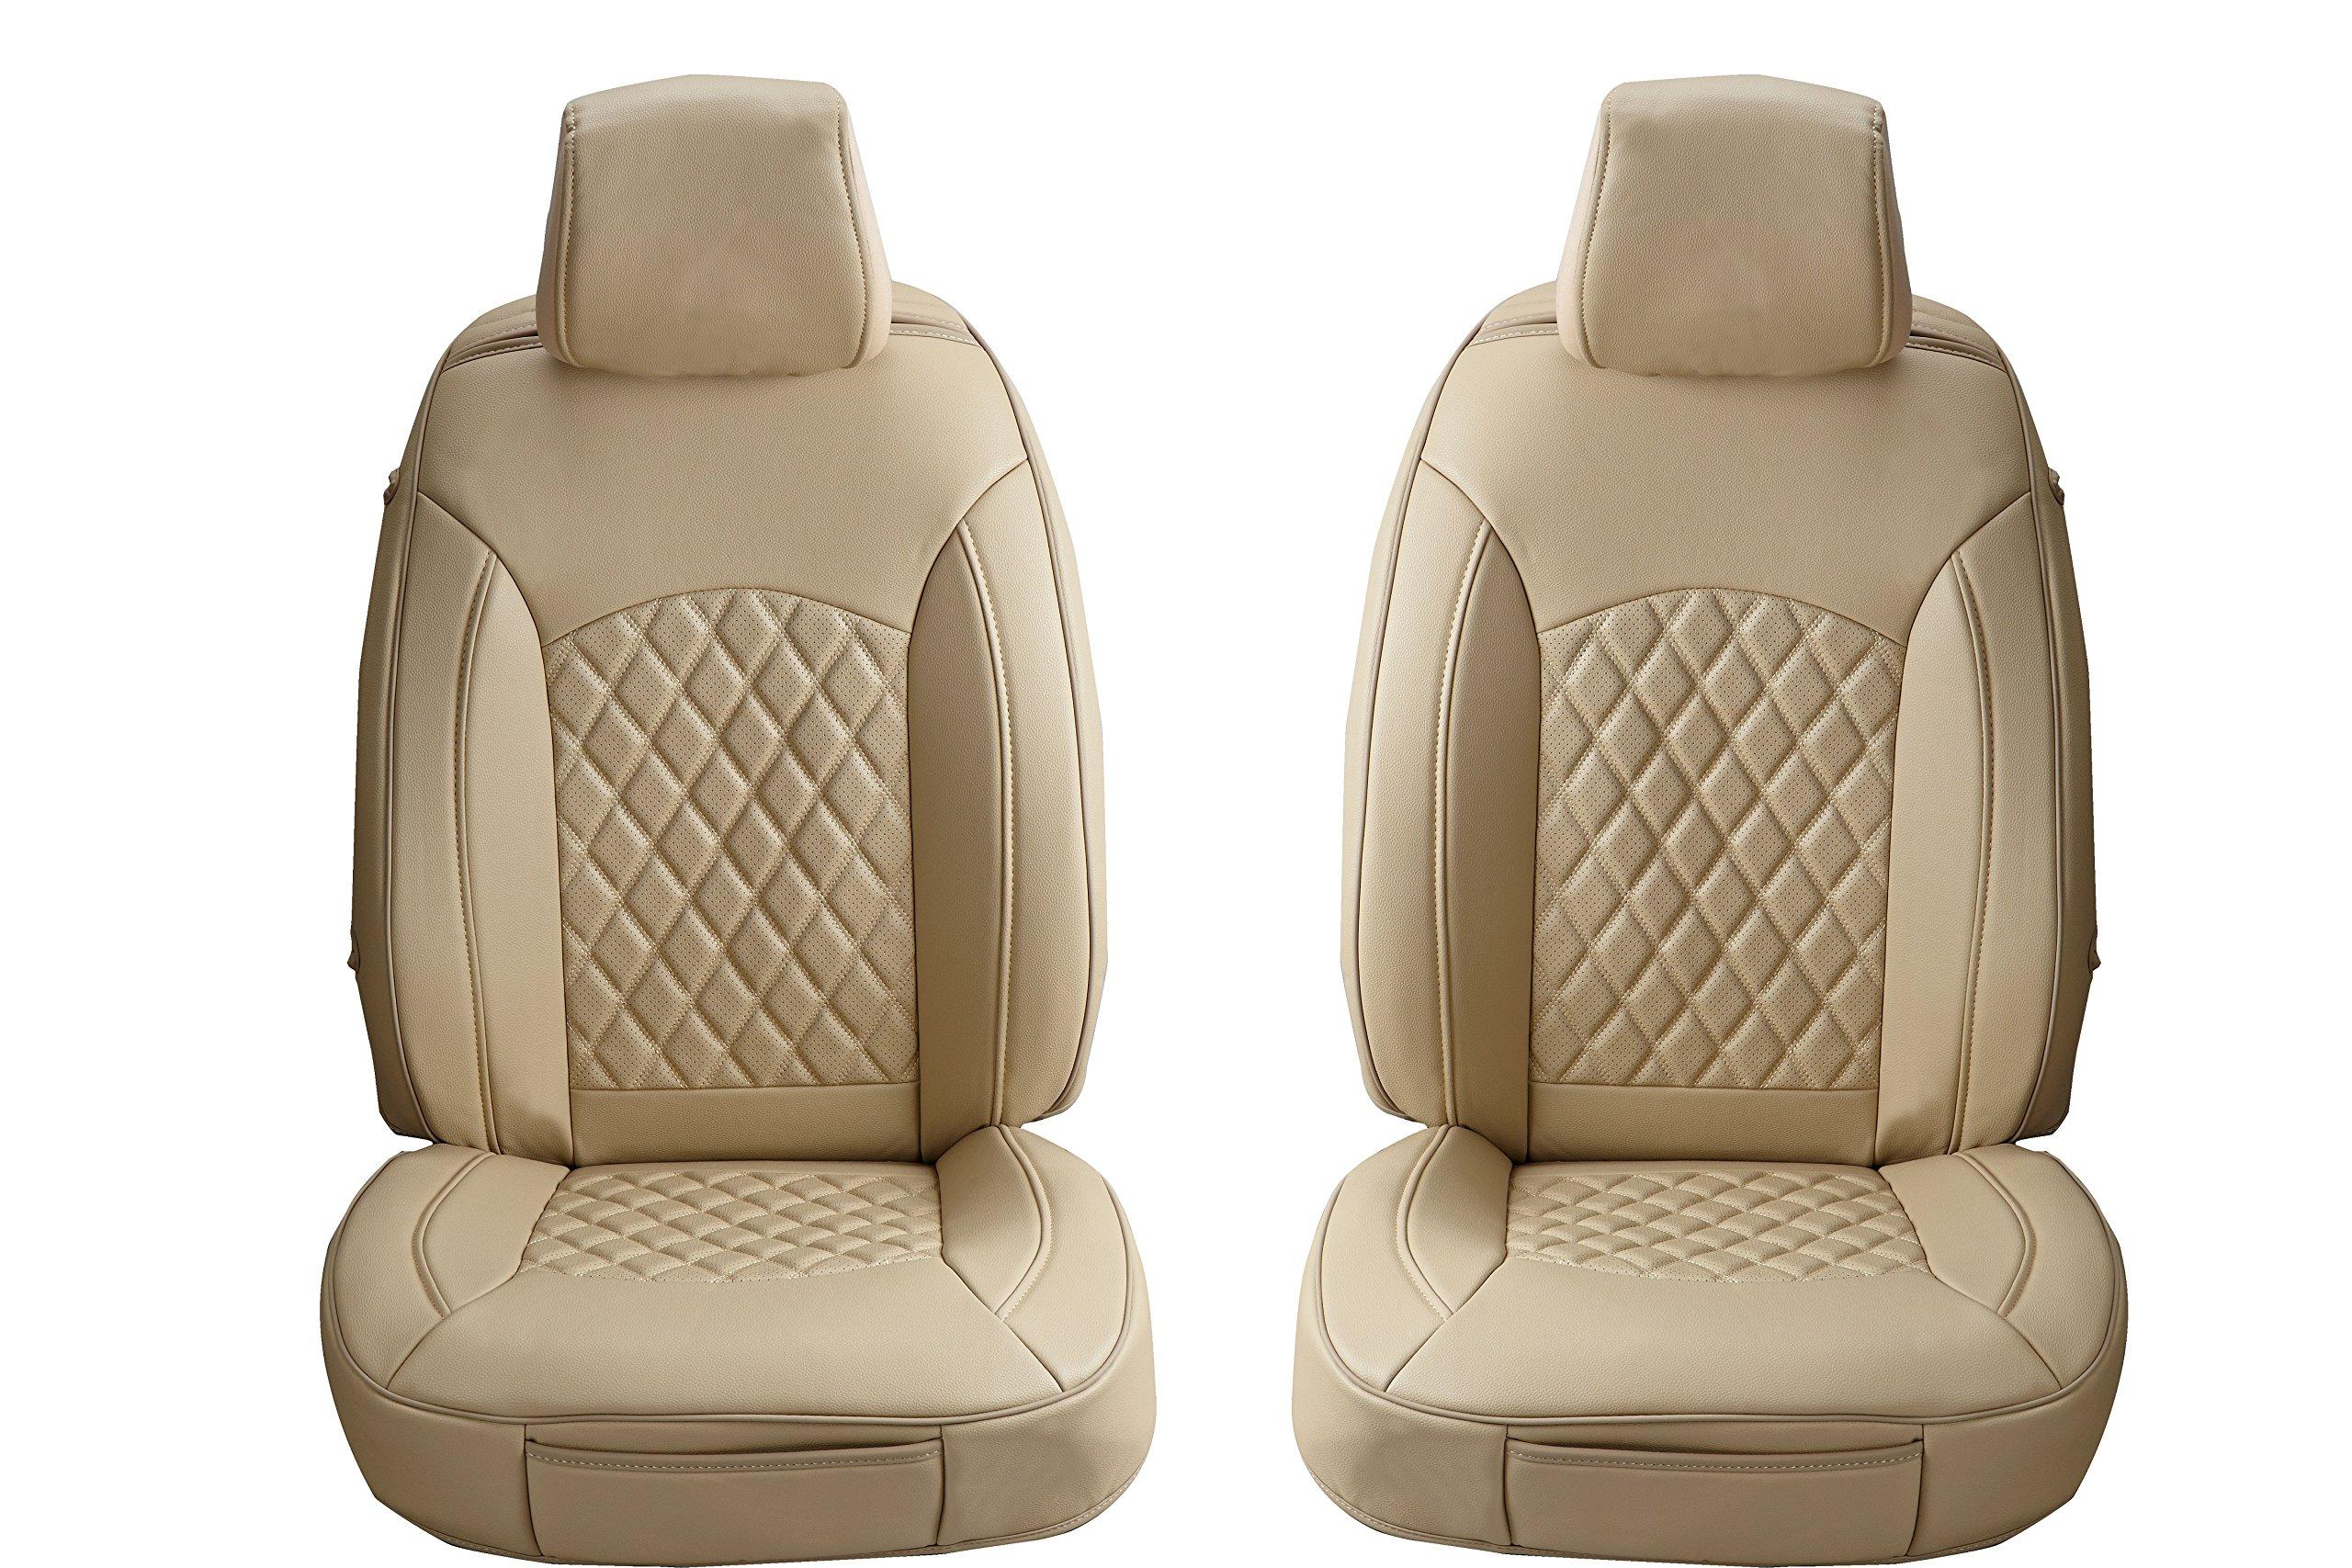 Aegis cover PV001TAN Tan Universal 3D Design PVC/PU Seat Covers (A Pair for Compact Sedan)